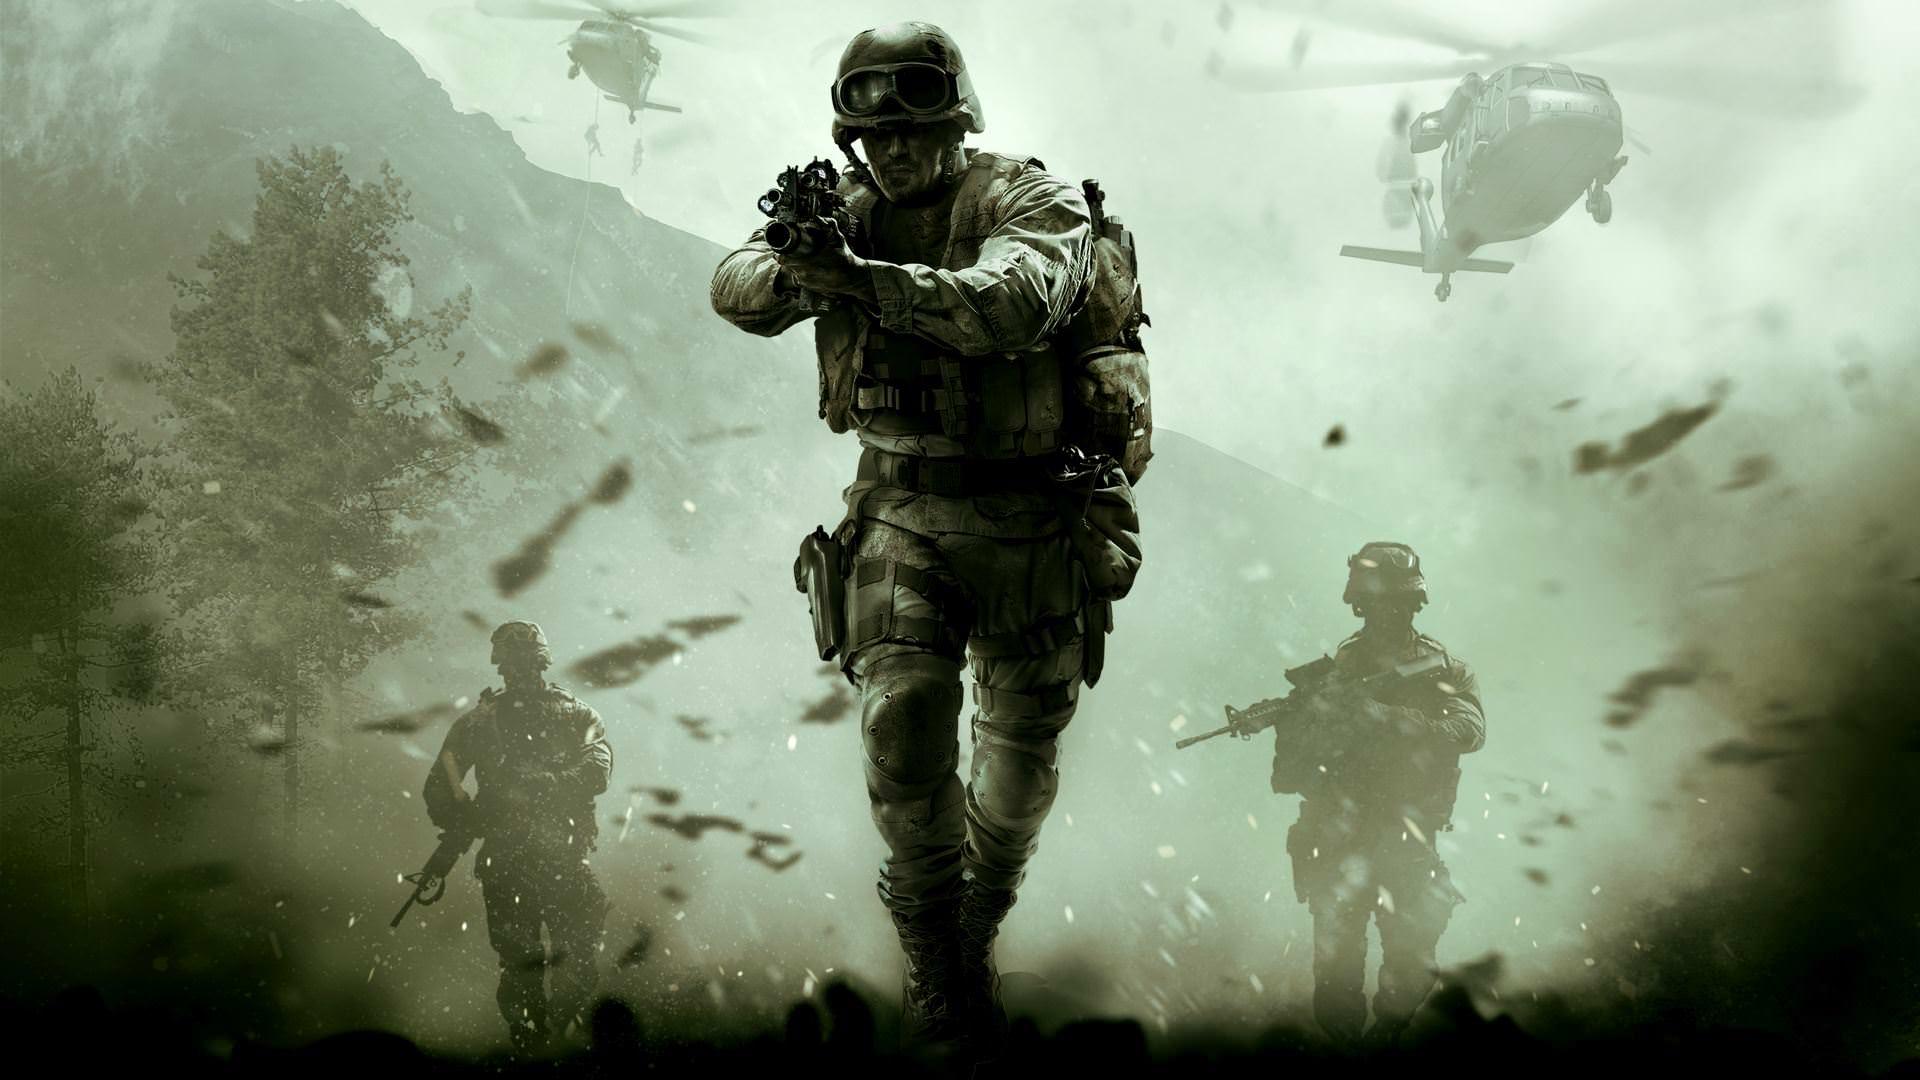 1920x1080 Call Of Duty Wallpaper ...